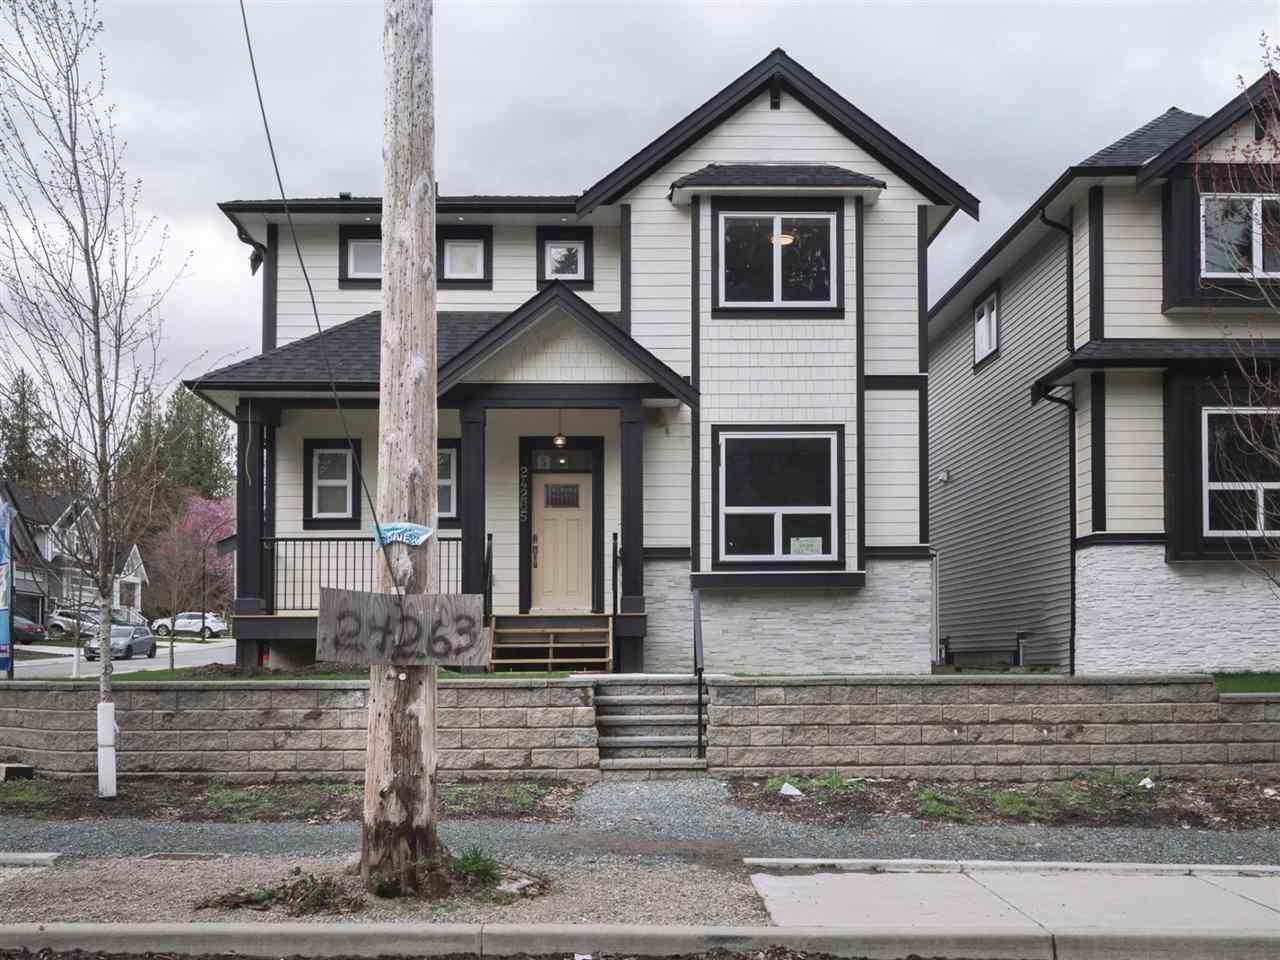 Main Photo: 24265 112 Avenue in Maple Ridge: Cottonwood MR House for sale : MLS®# R2253407